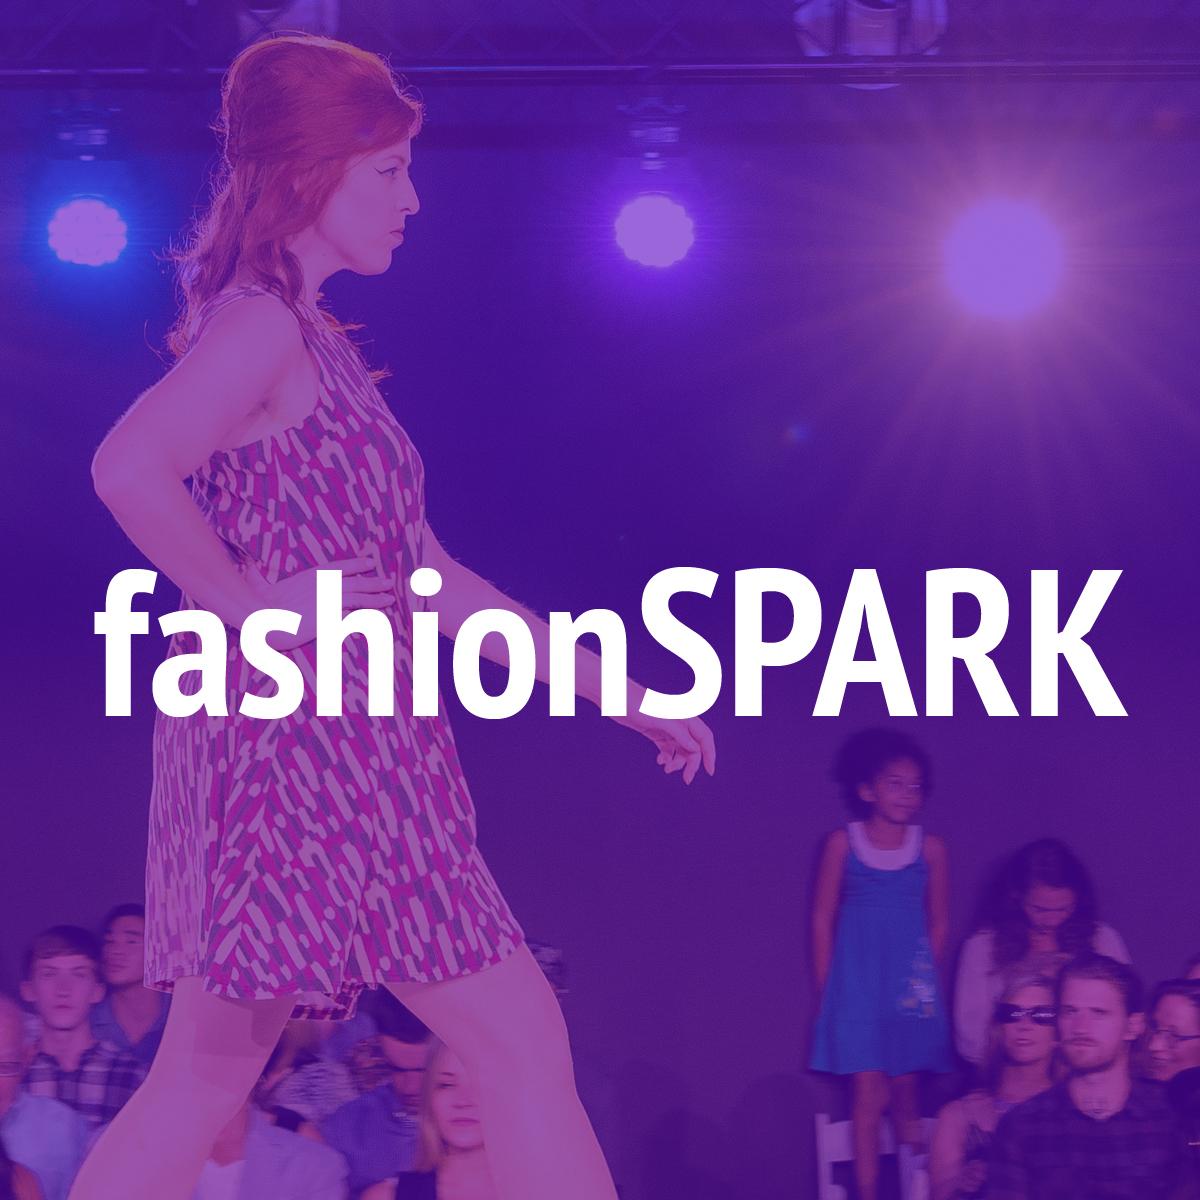 fashionspark.jpg